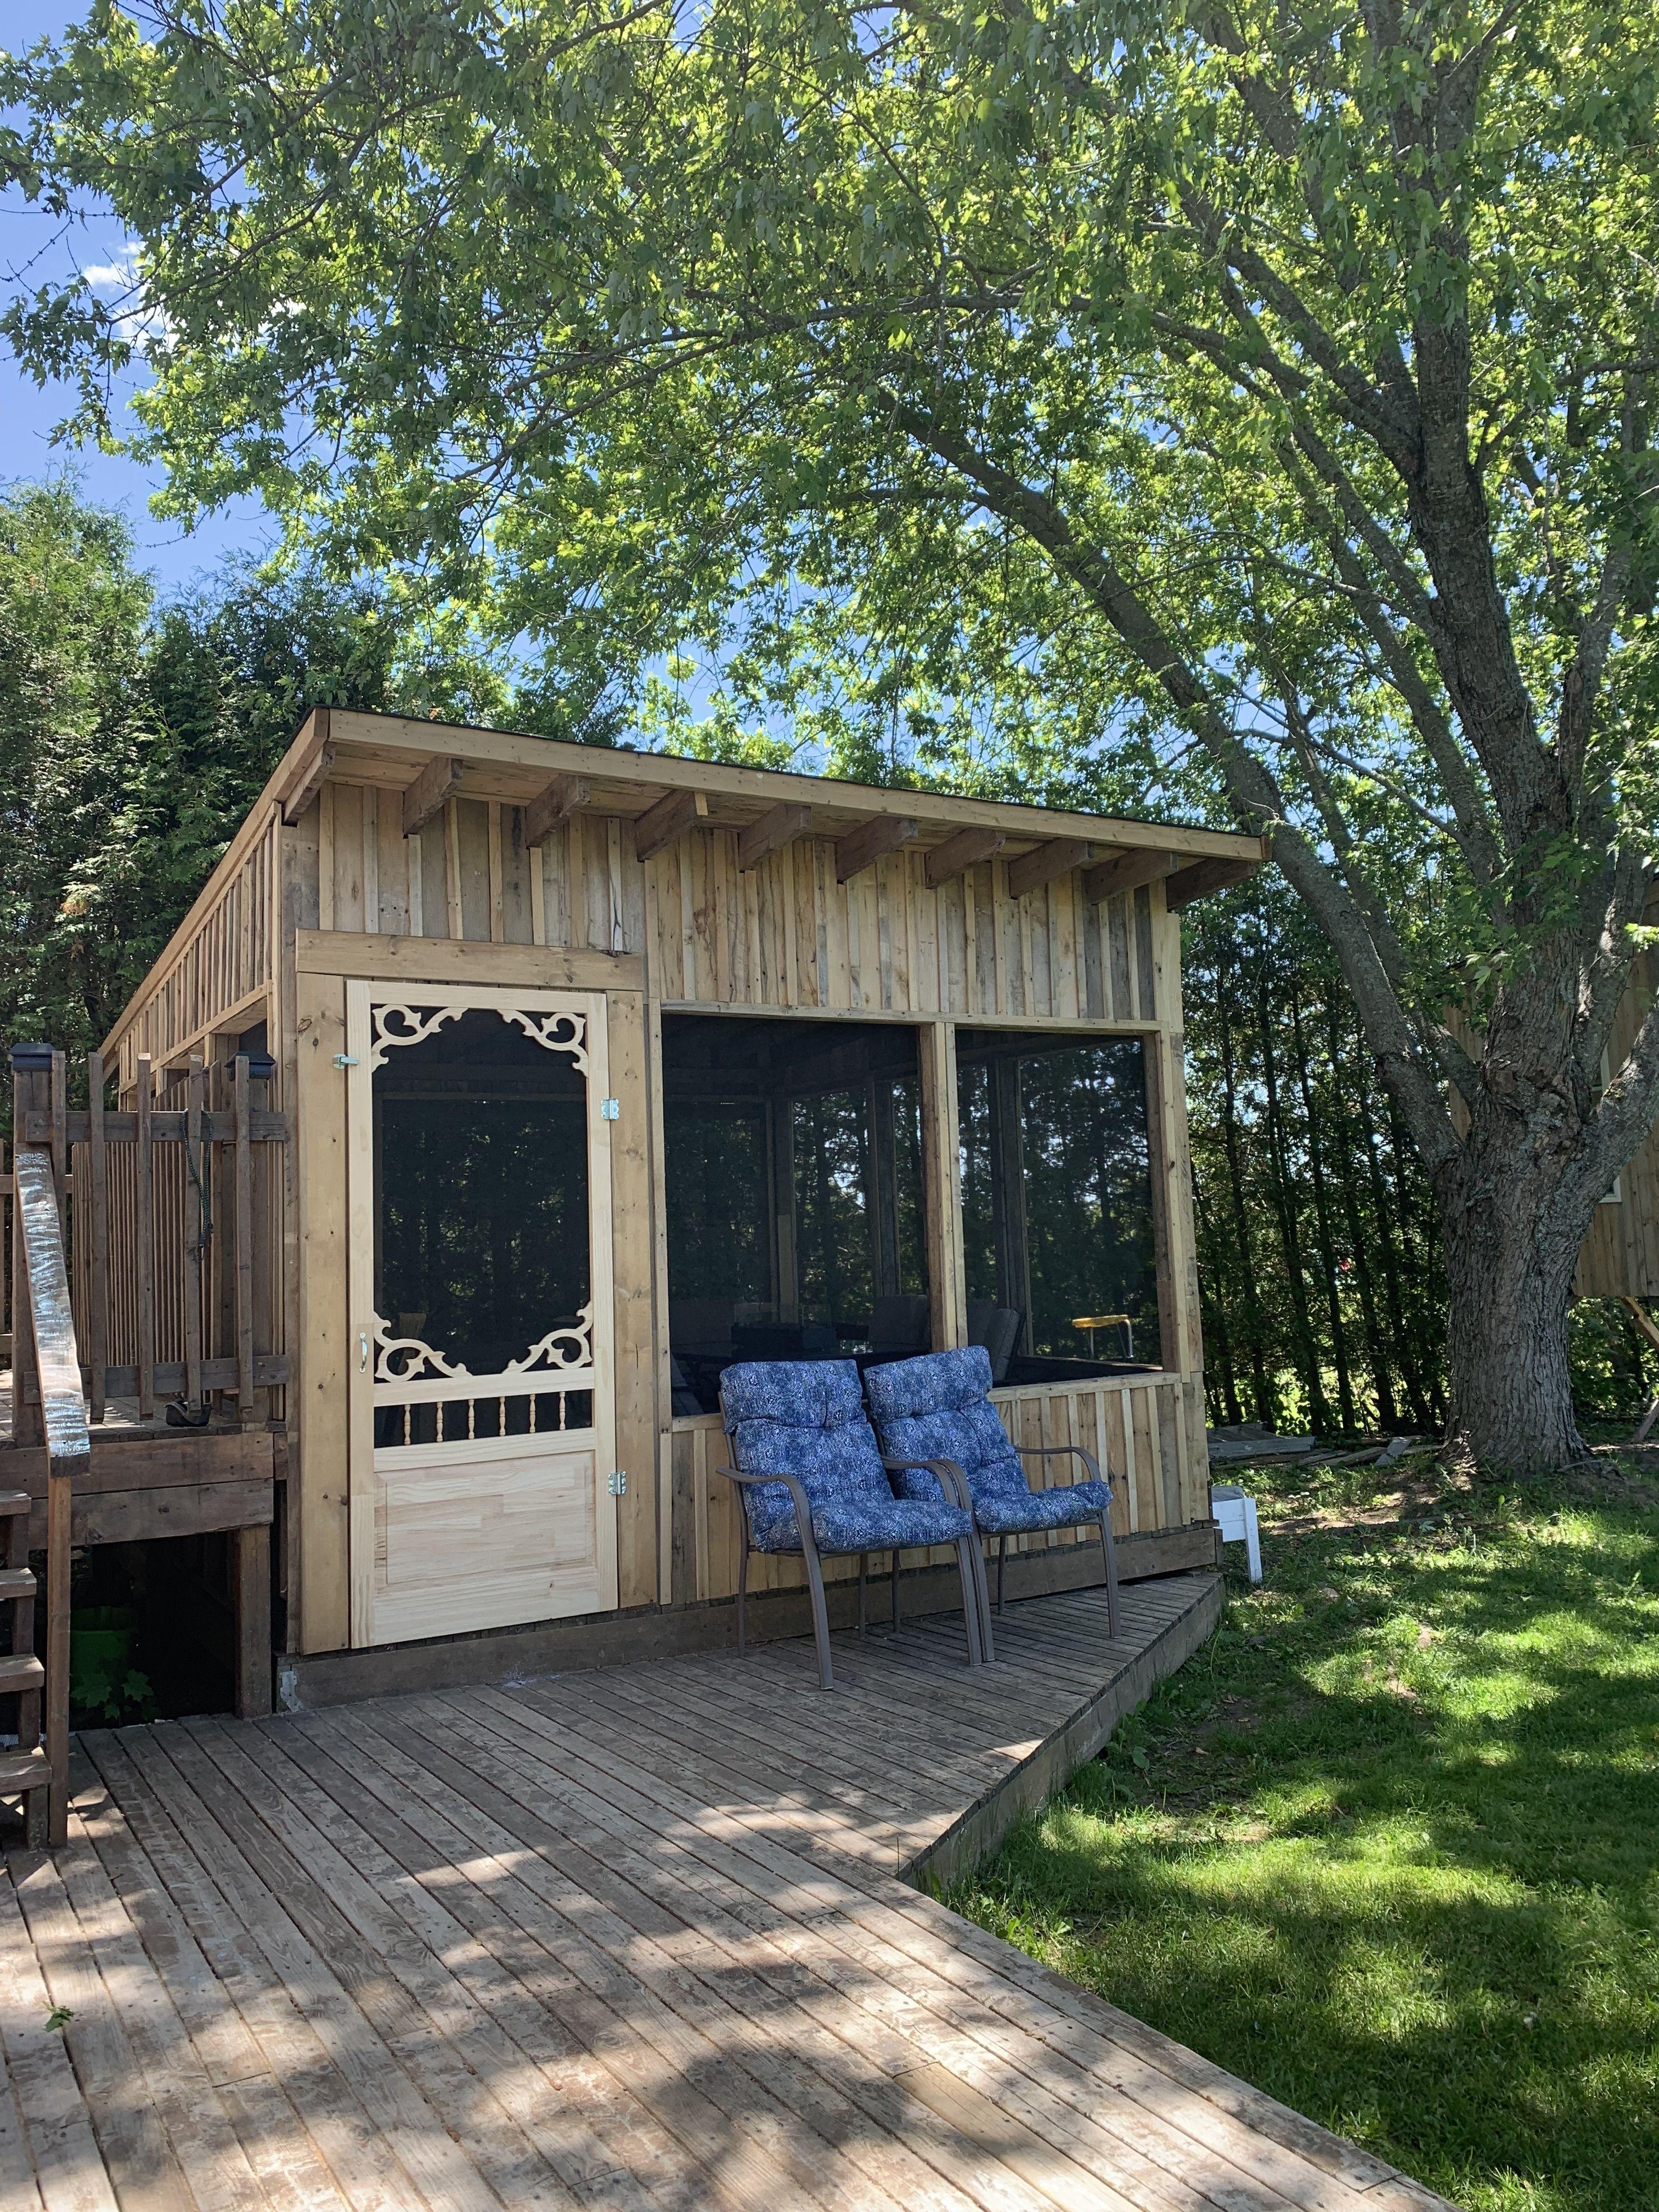 Pallet Gazebo | Gazebo, House styles, Outdoor structures